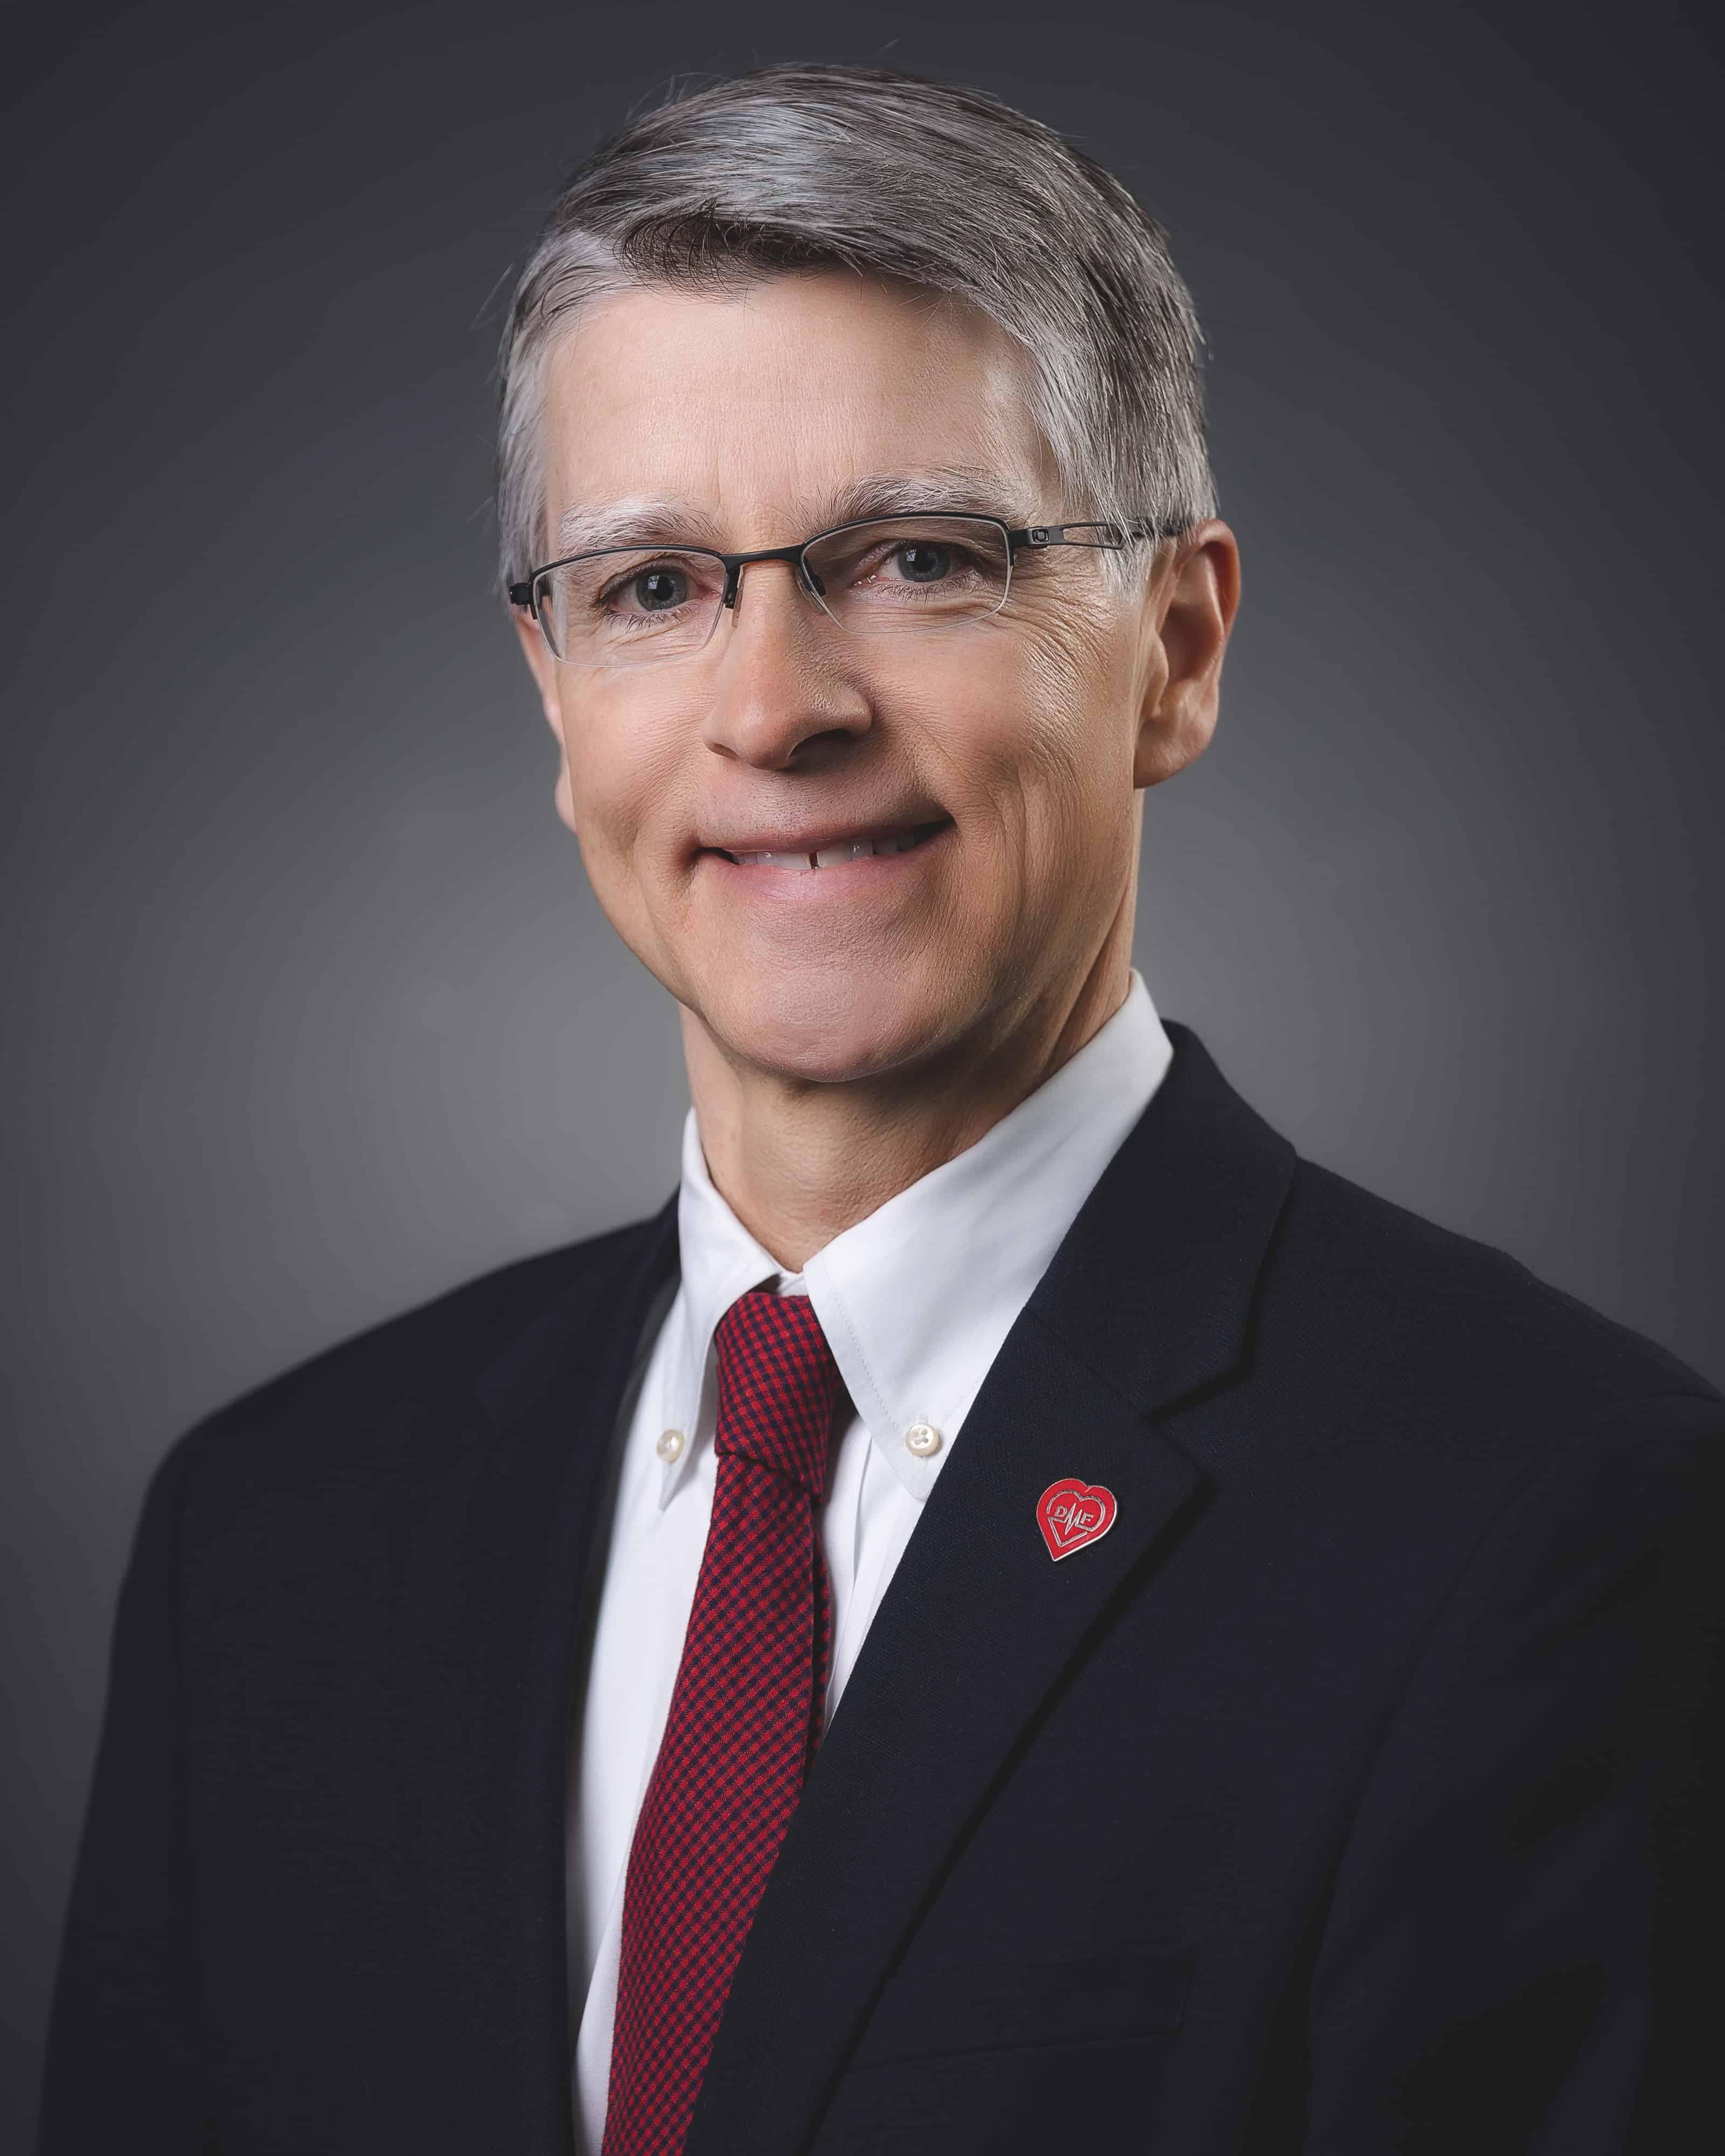 J. Patrick Traynor, DMF Executive Director